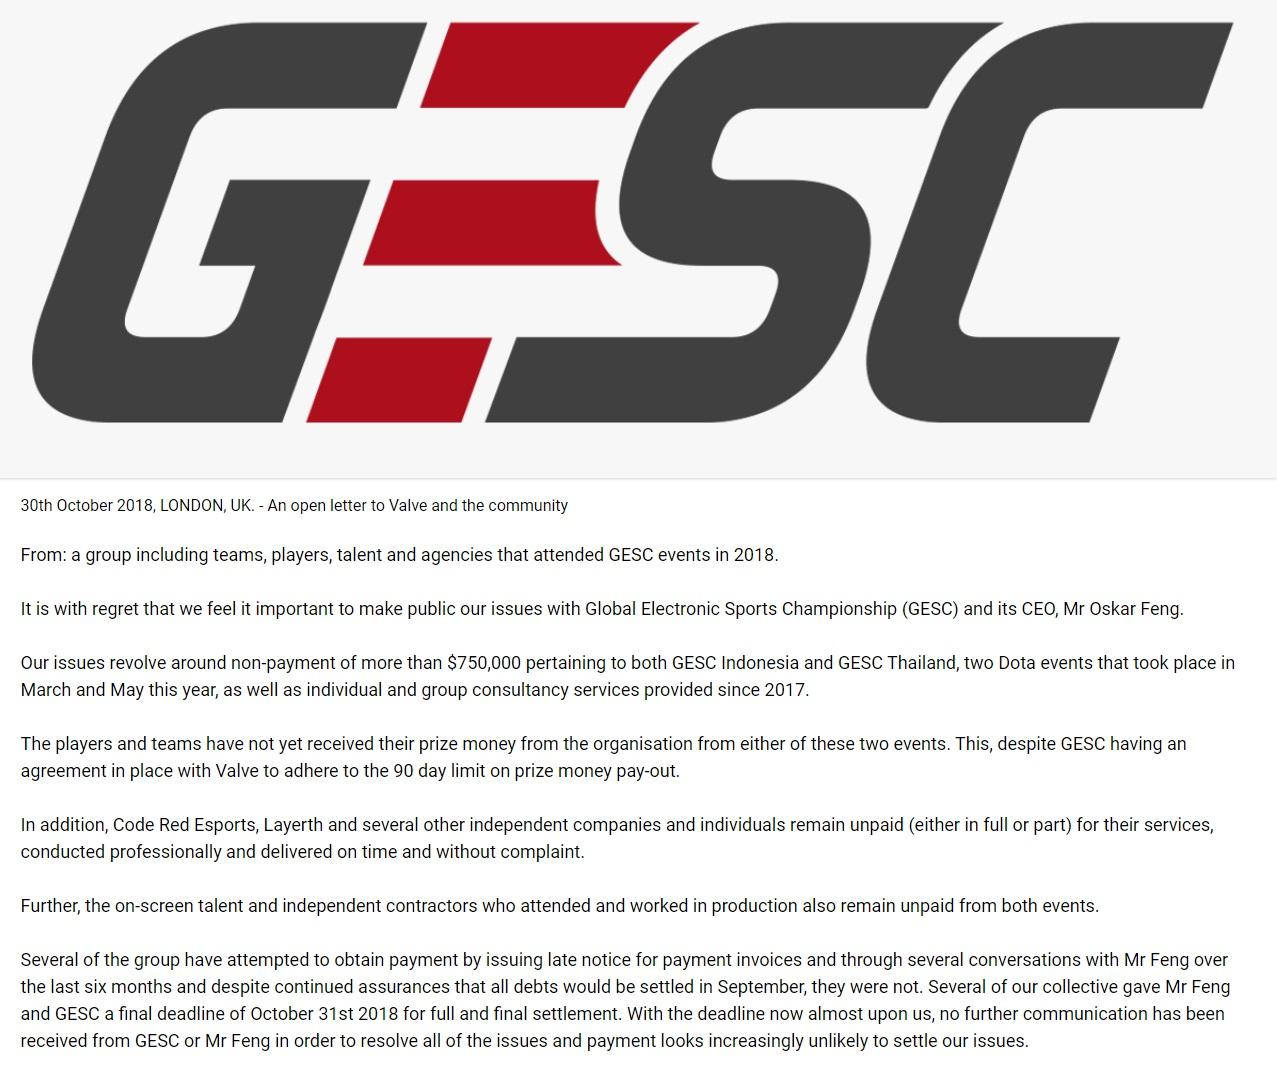 gesc letter - Valve khởi kiện tổ chức eSports Singapore bởi cáo buộc nợ 750.000$